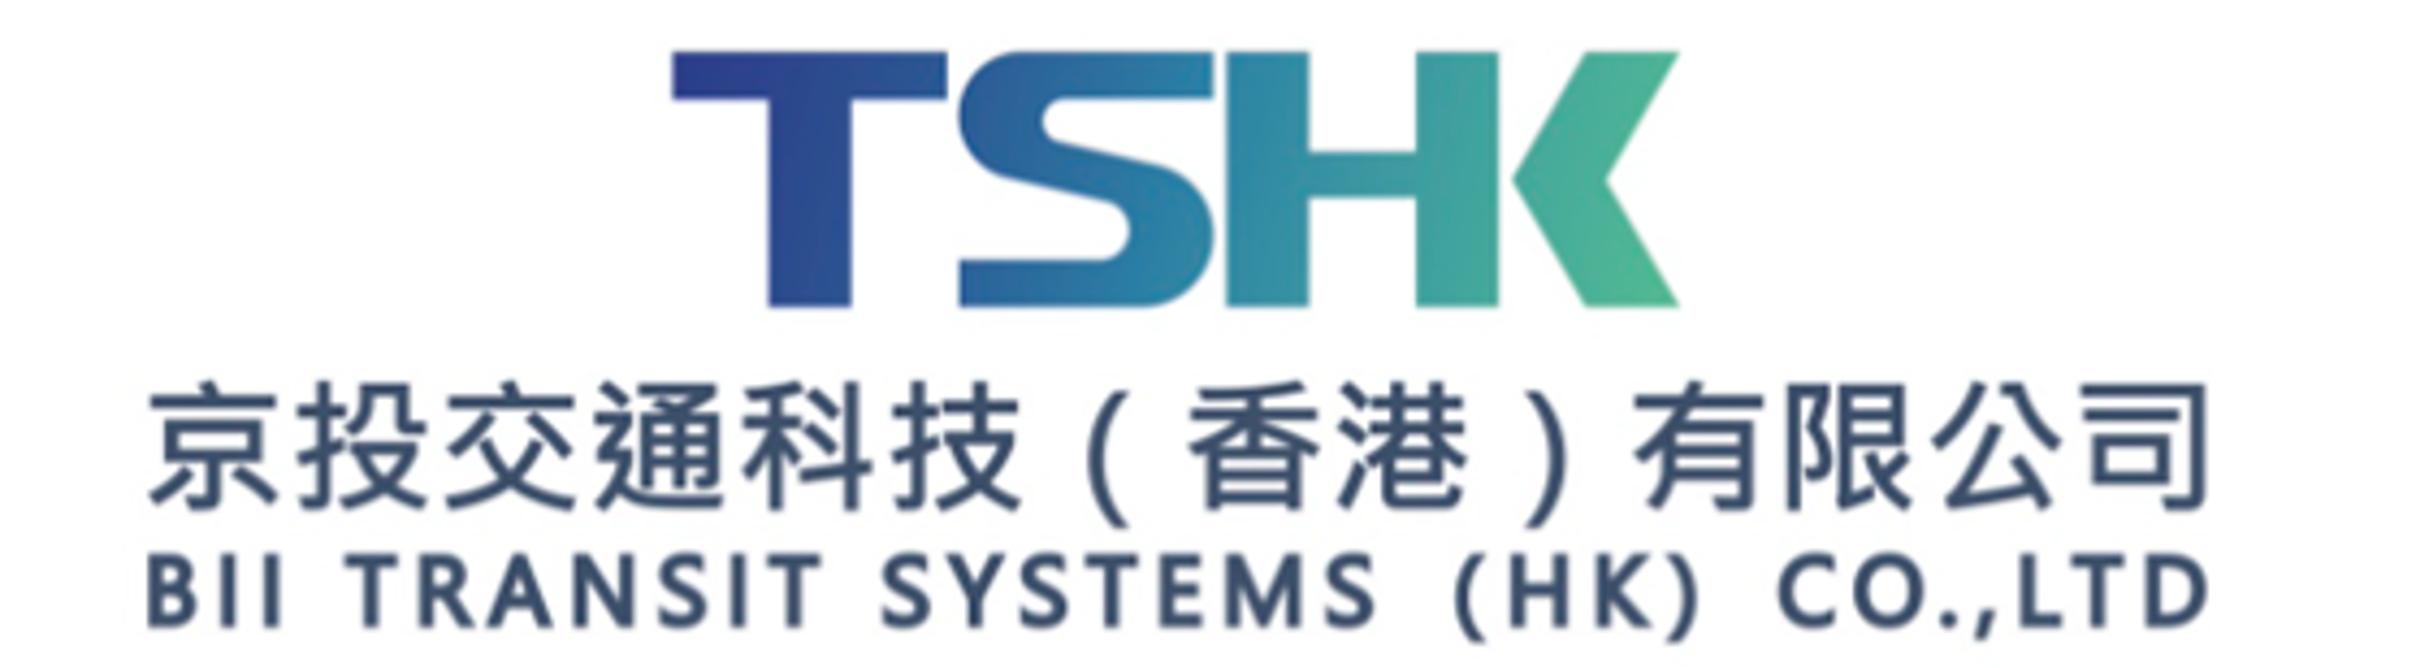 BII Transit Systems (HK) logo for desktop